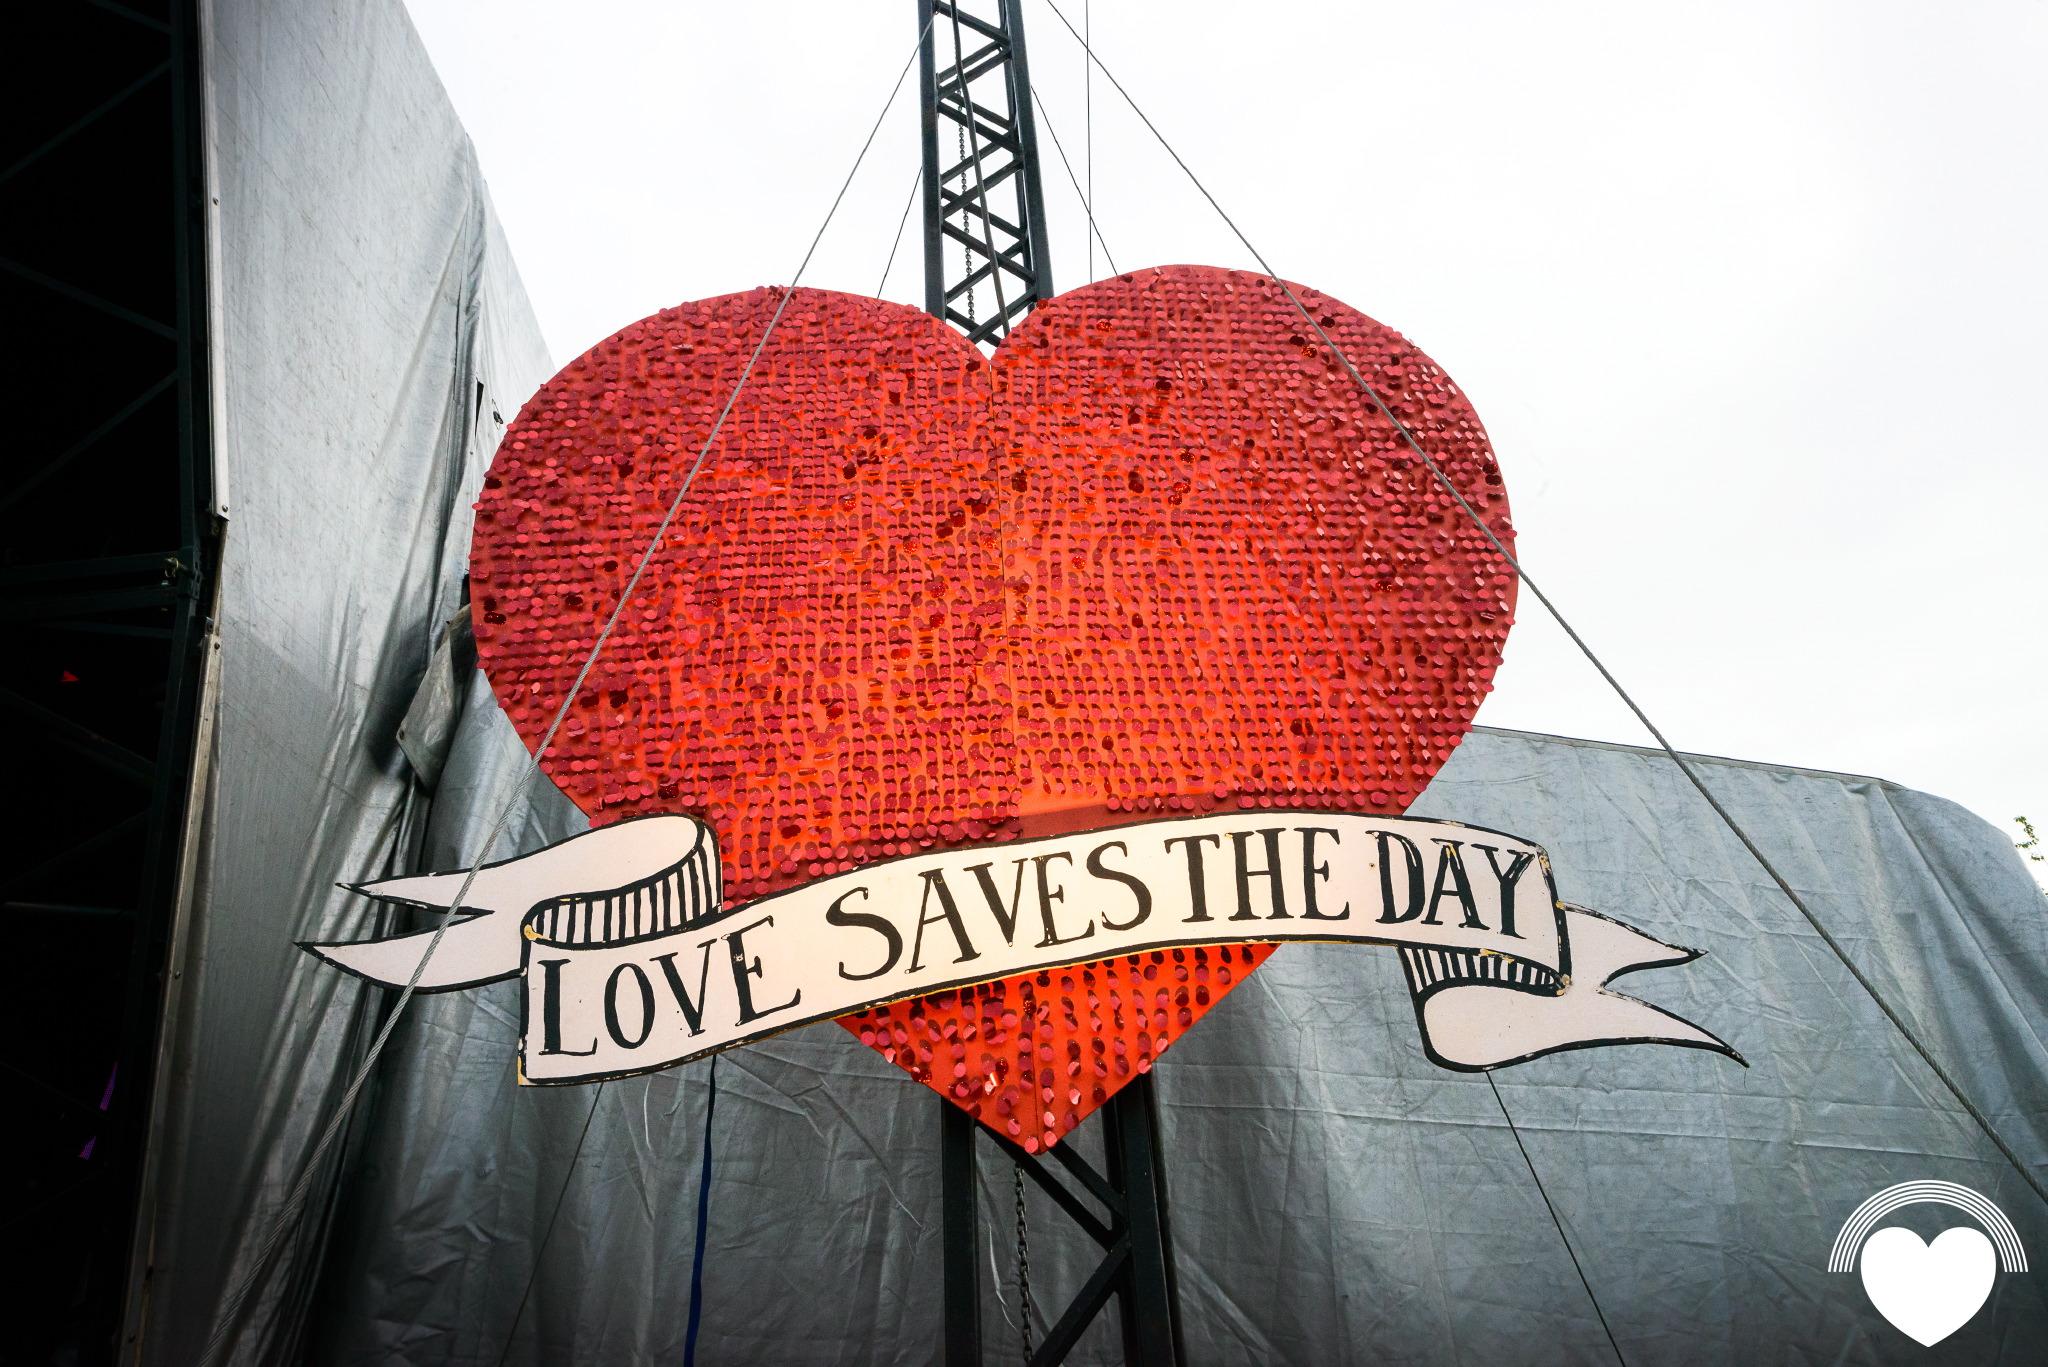 Love Saves the Day Bristol